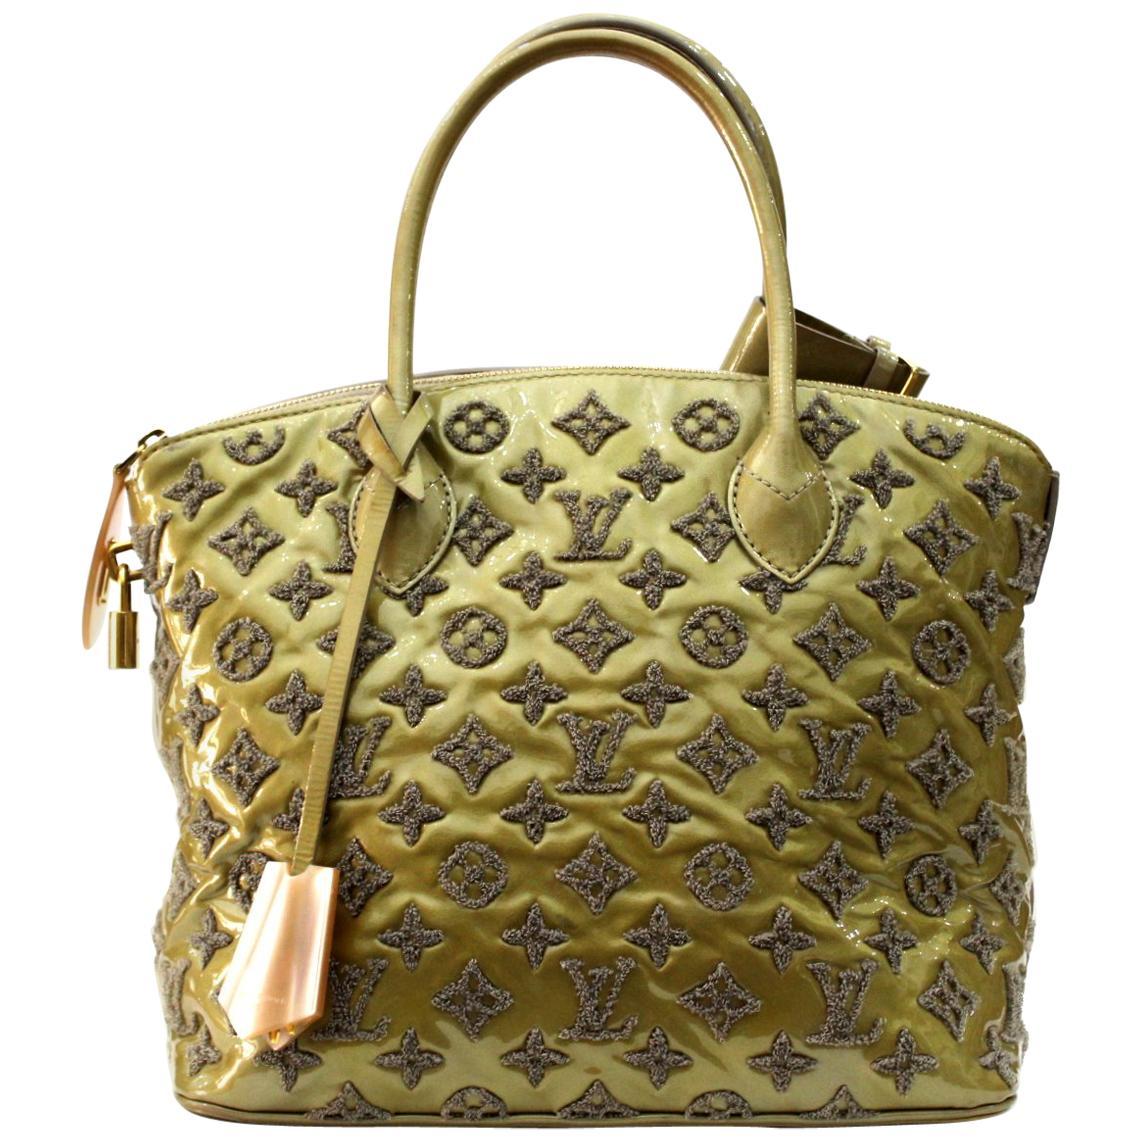 2011 Louis Vuitton Lockit Gris Limited Edition